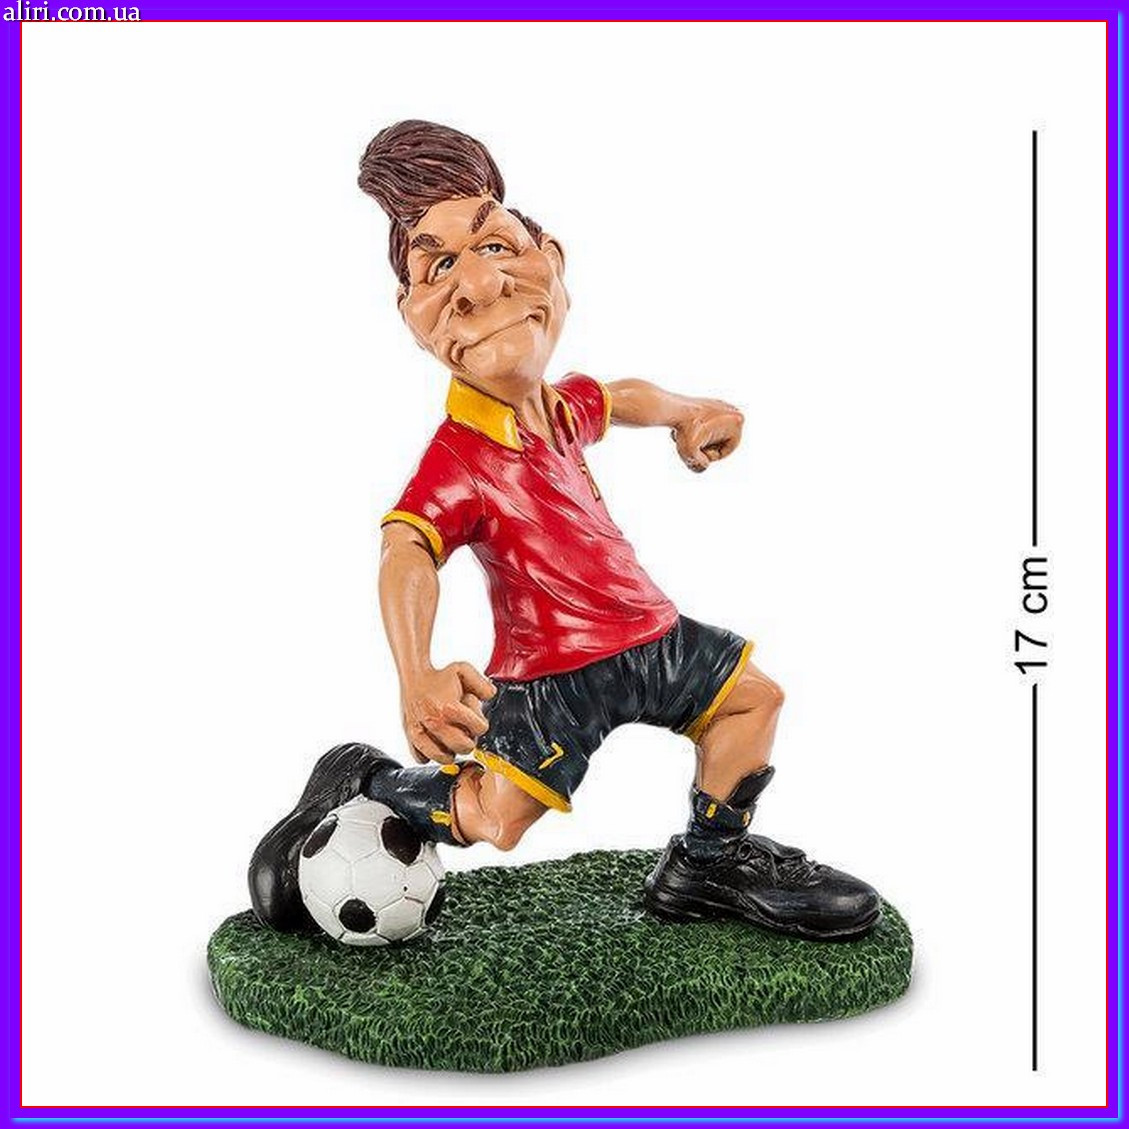 Статуэтка Футболист Stratford супер подарок